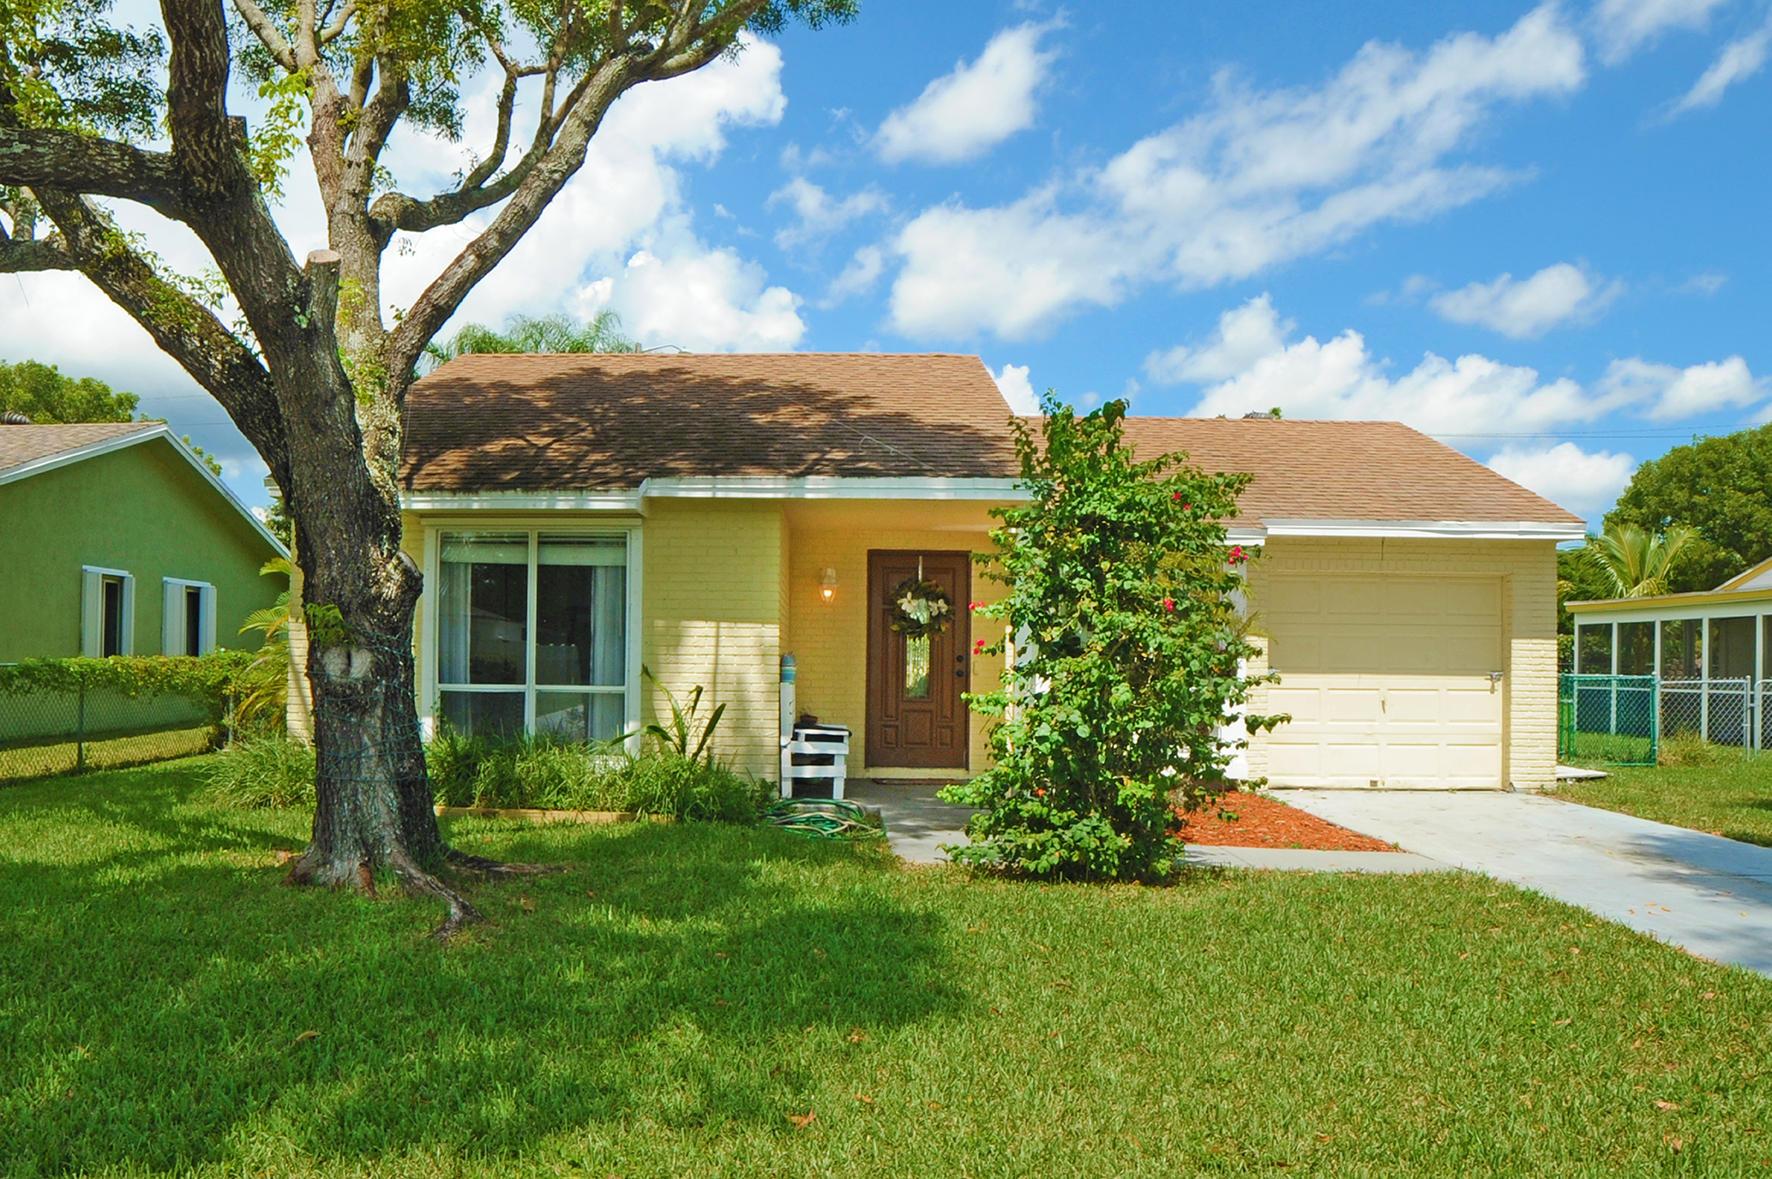 8339 Garden Gate Place Boca Raton, FL 33433